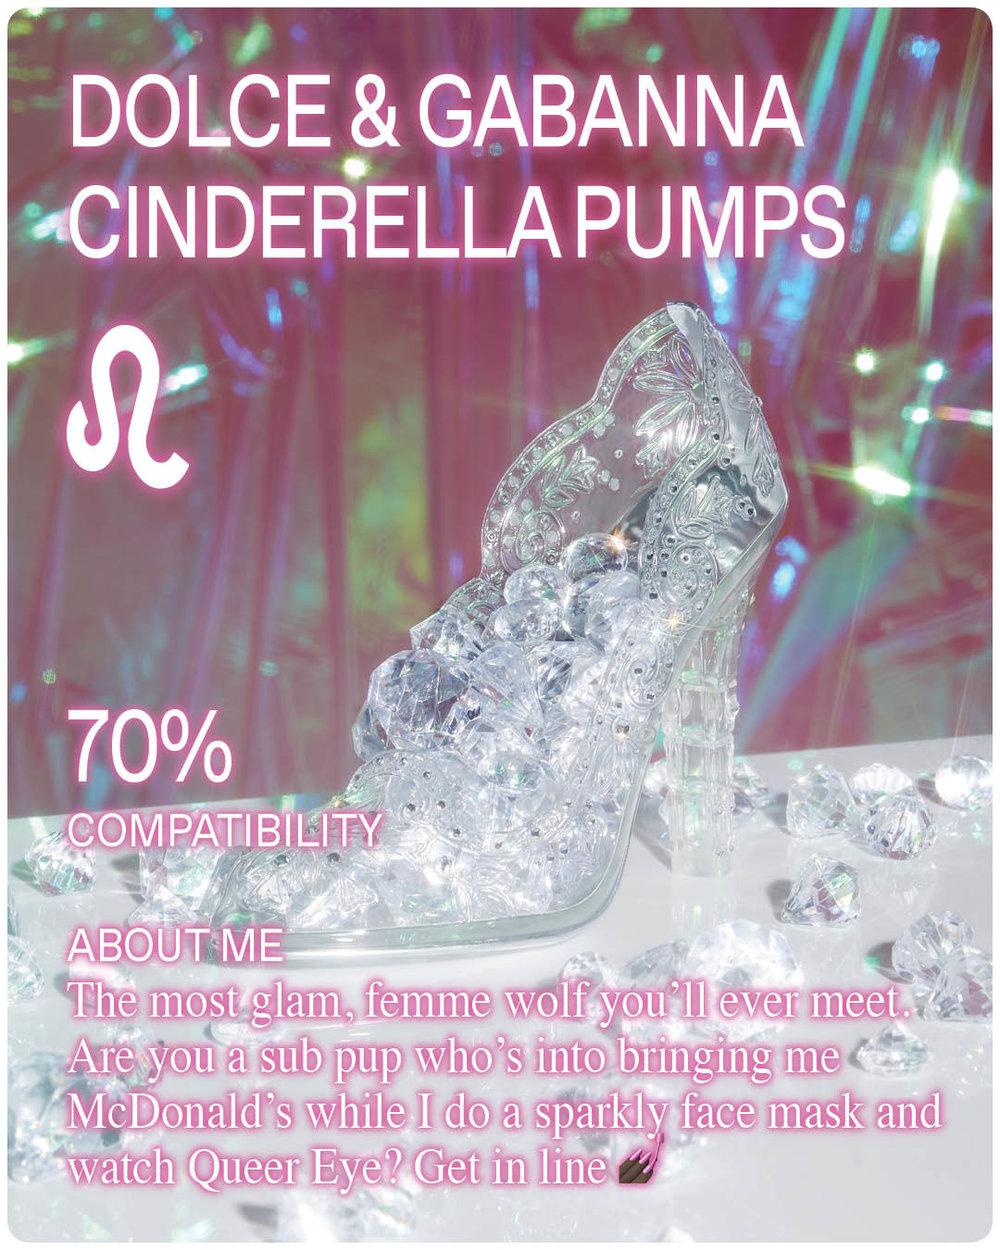 Dolce and Gabbana Cinderella Shoe Slipper with Diamonds